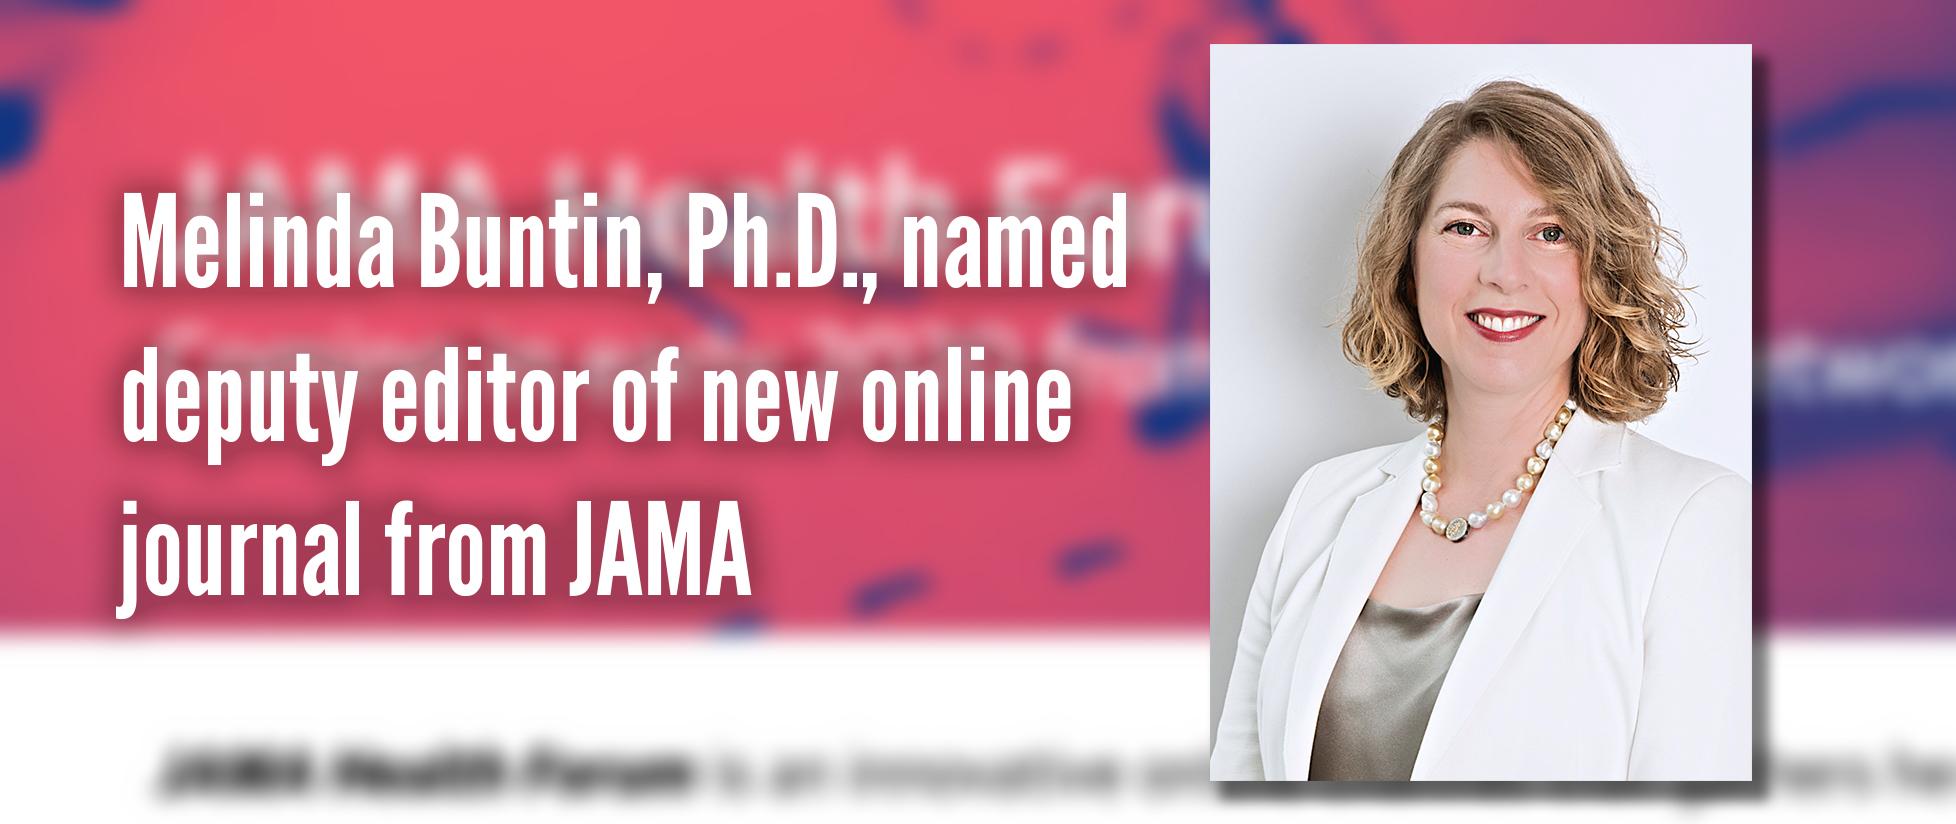 melinda buntin named deputy editor of new journal